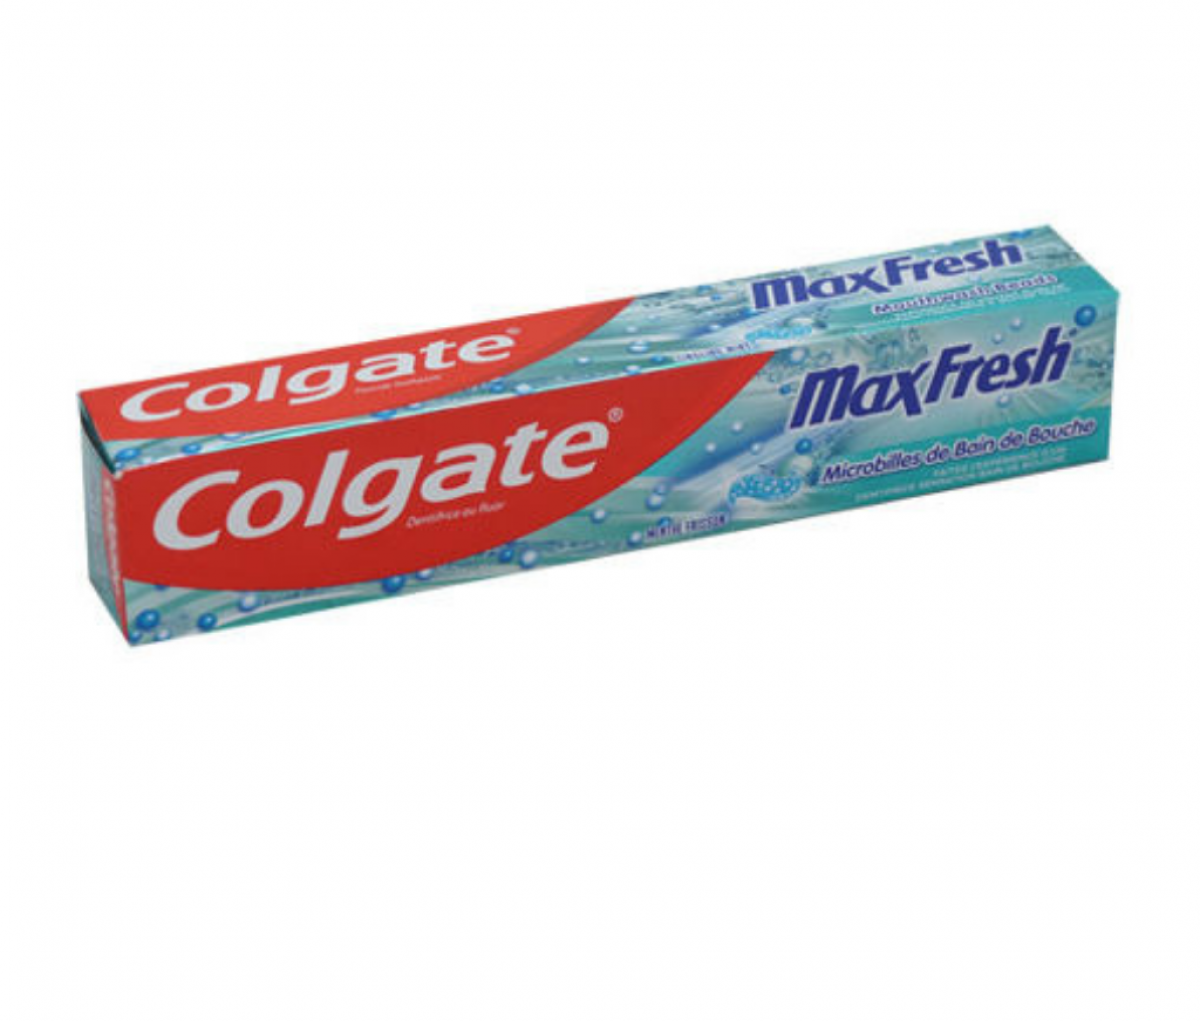 Colgate 75ml Max Fresh Microbilles Toothpaste